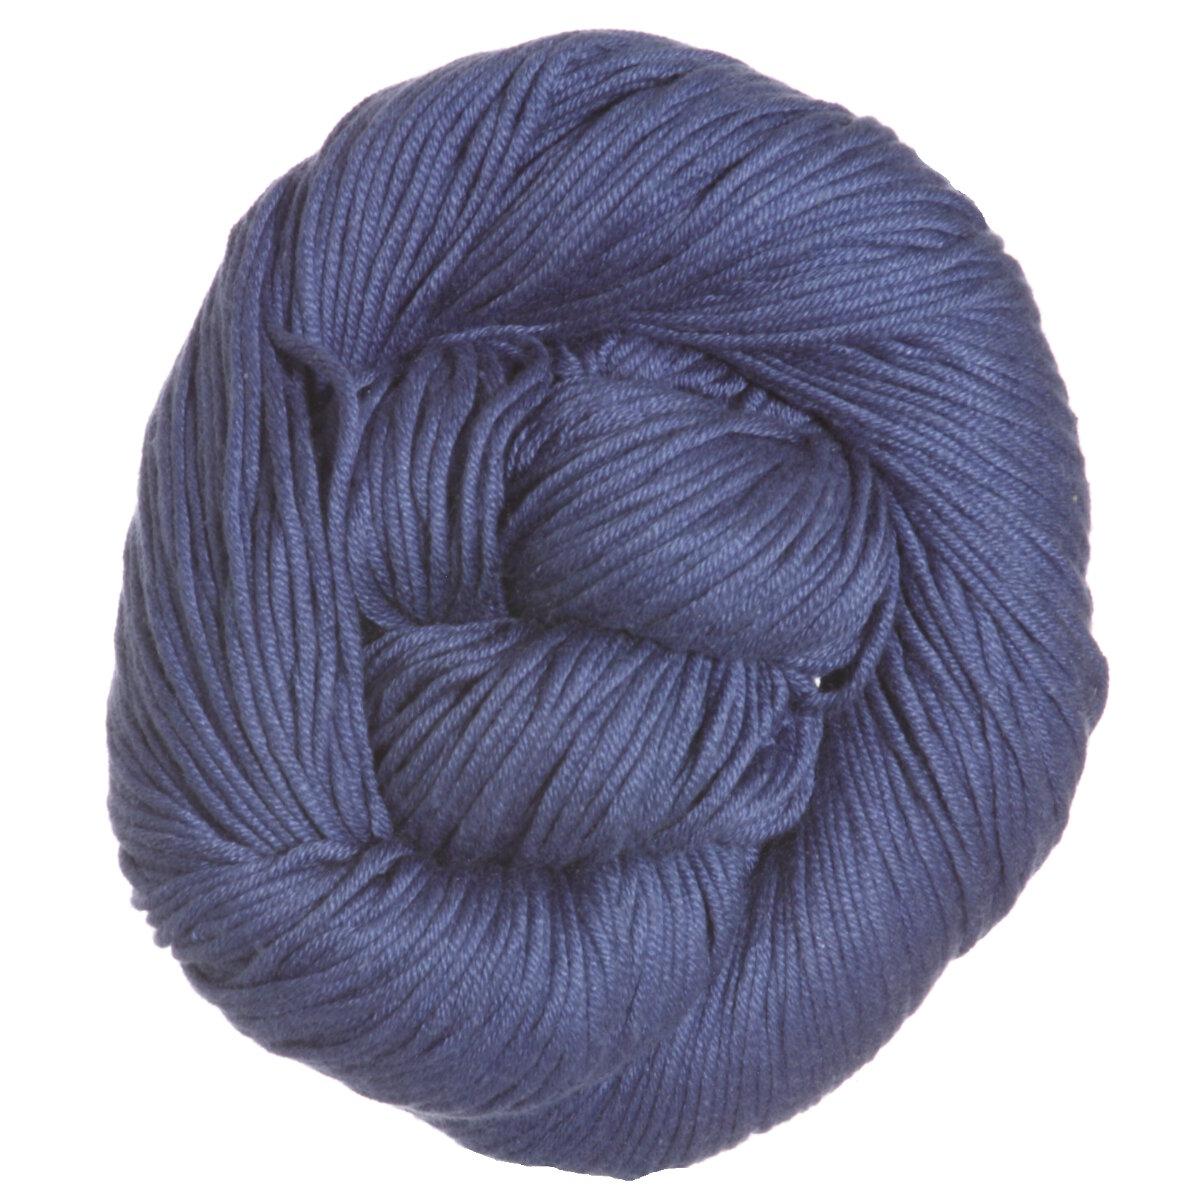 Modal Knitting Yarn : Berroco modern cotton yarn at jimmy beans wool